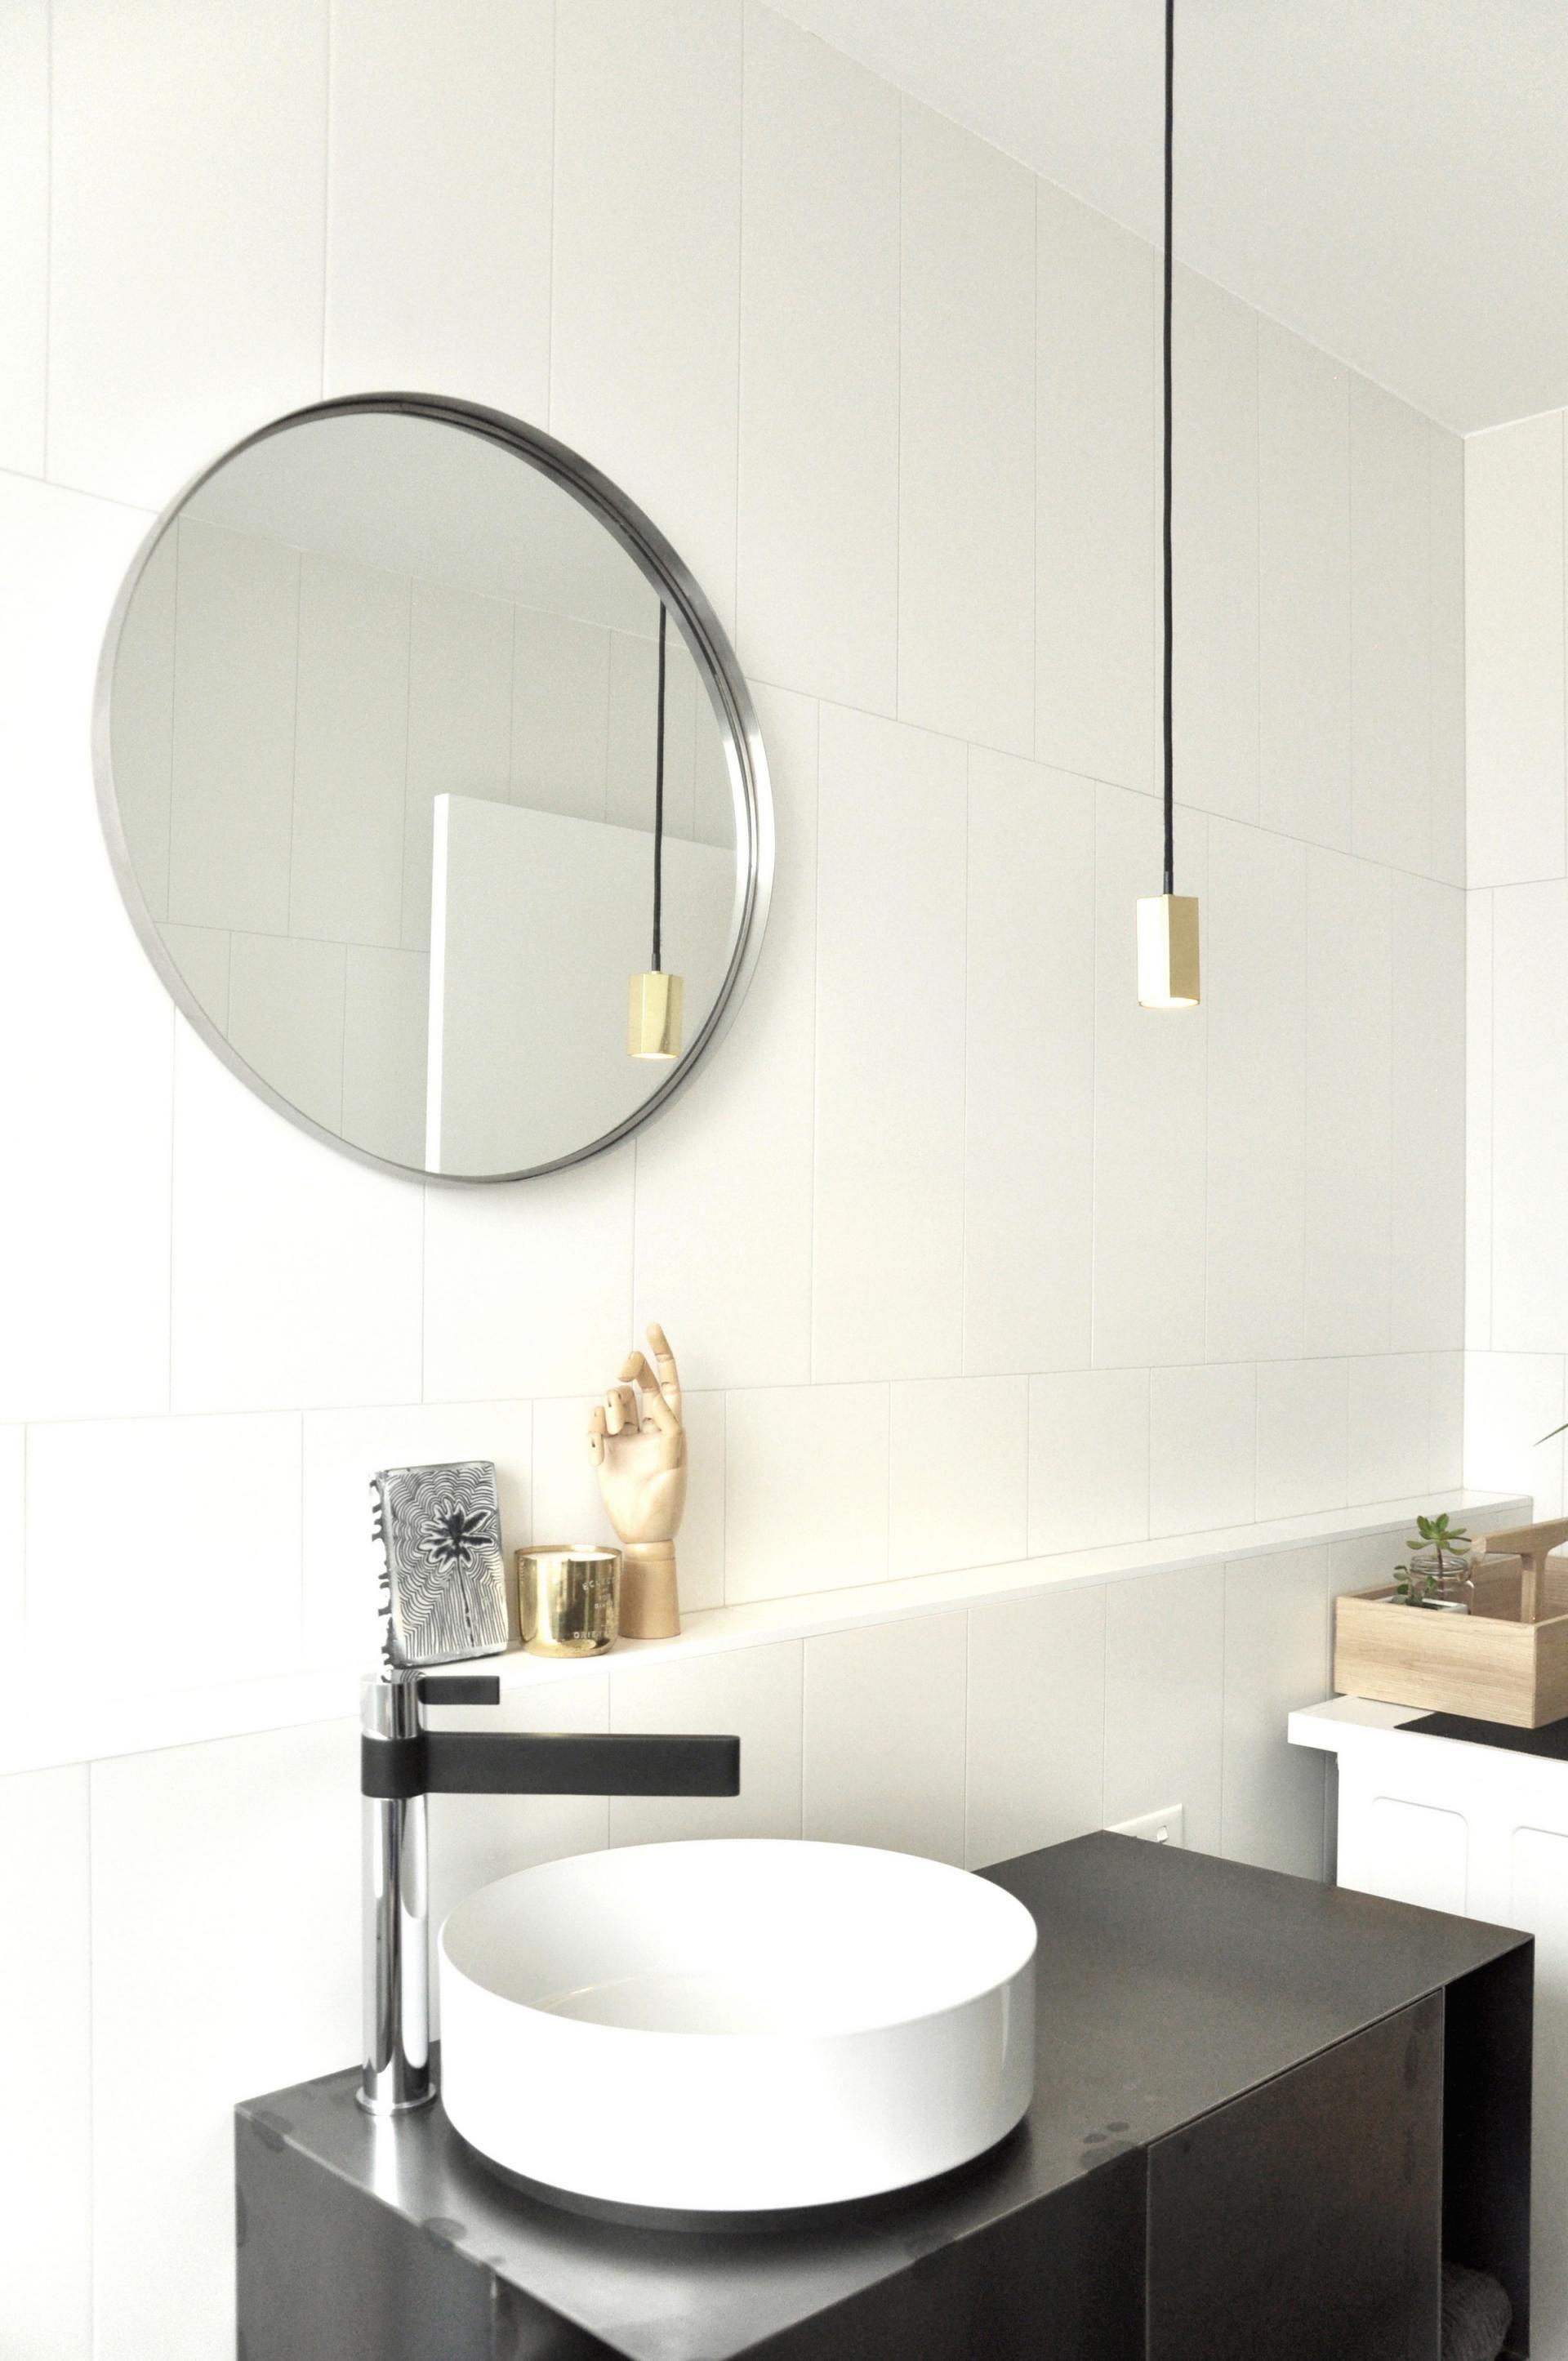 Ashfield Apartment By Archier Via Lunchbox Architect Bathroomd Bathroom Inspiration Modern Modern Bathroom Light Fixtures Bathroom Design Software